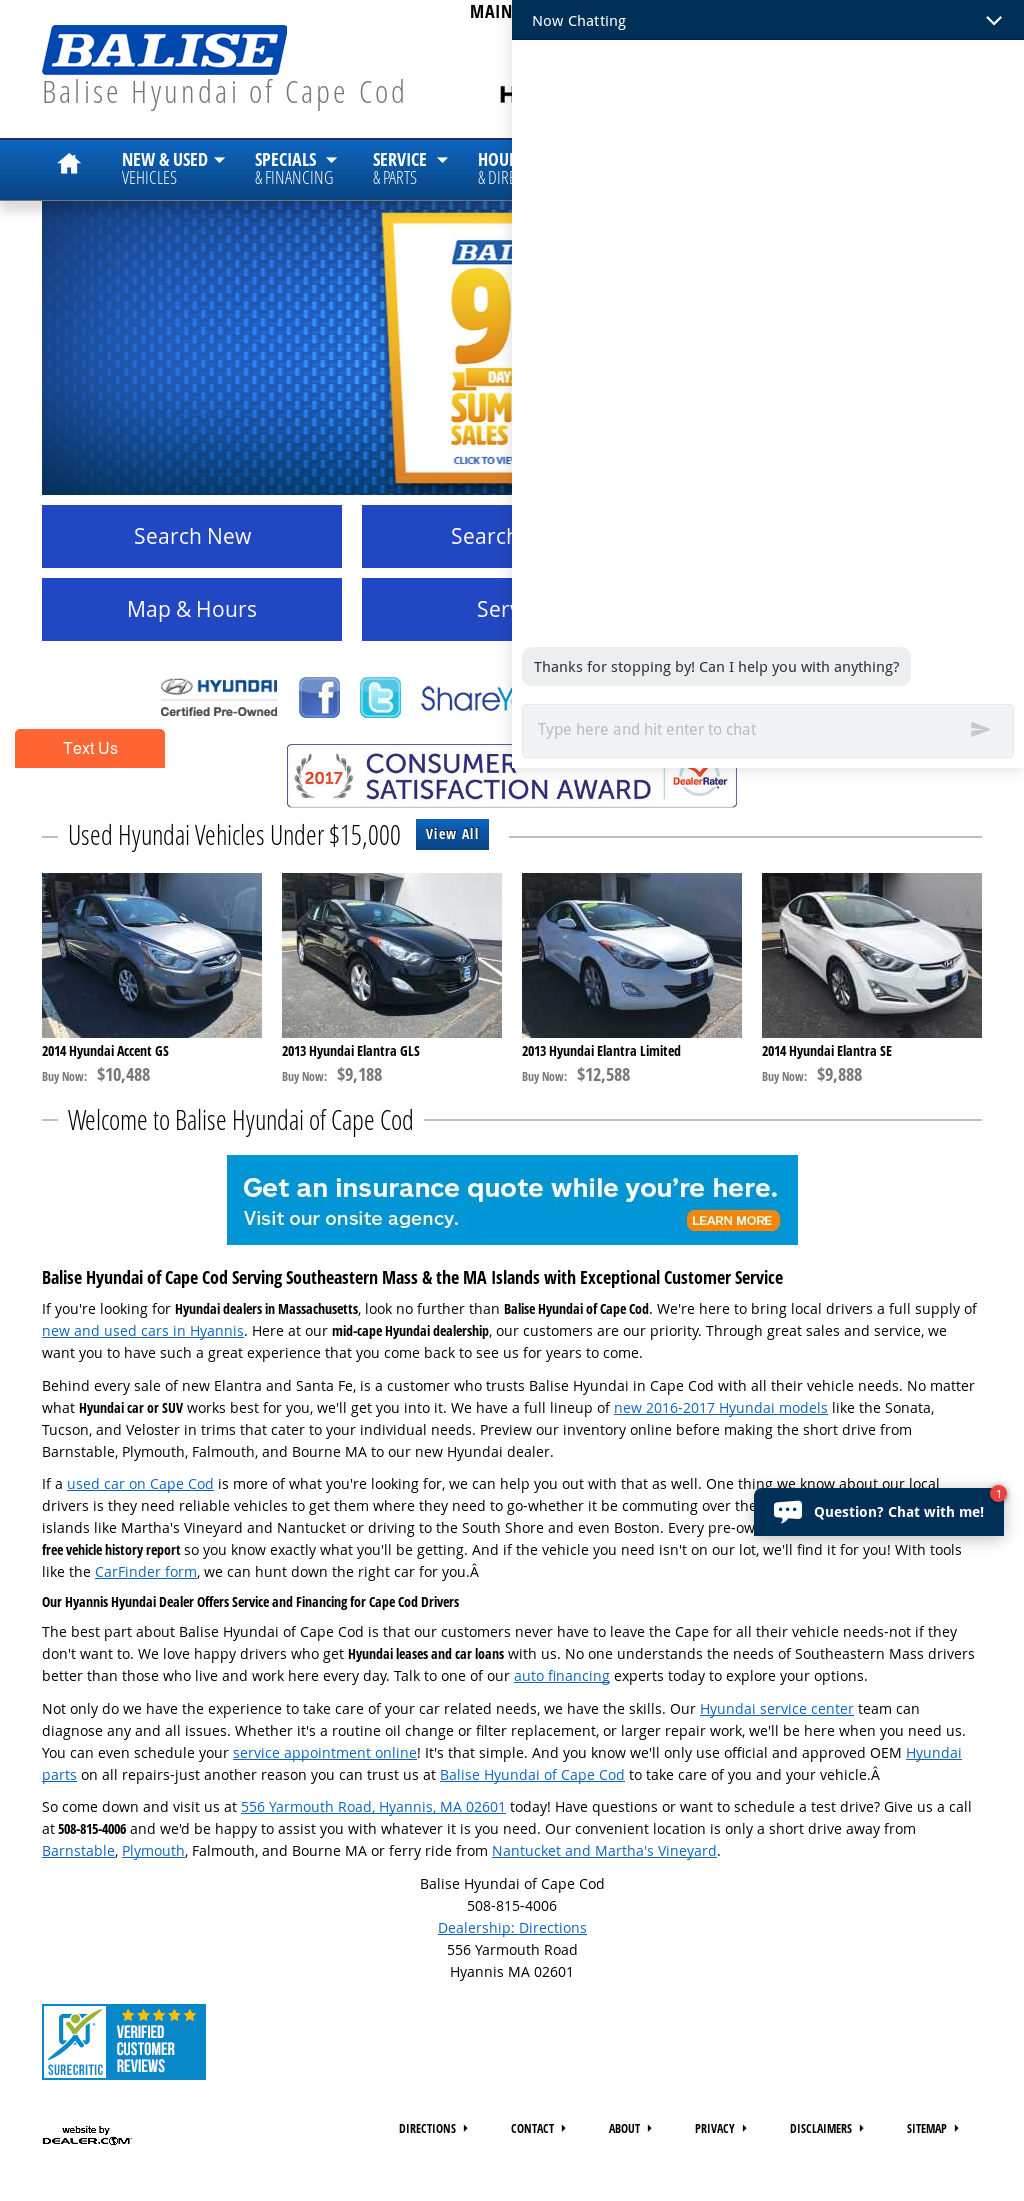 Wonderful Balise Hyundai Of Cape Cod Website History